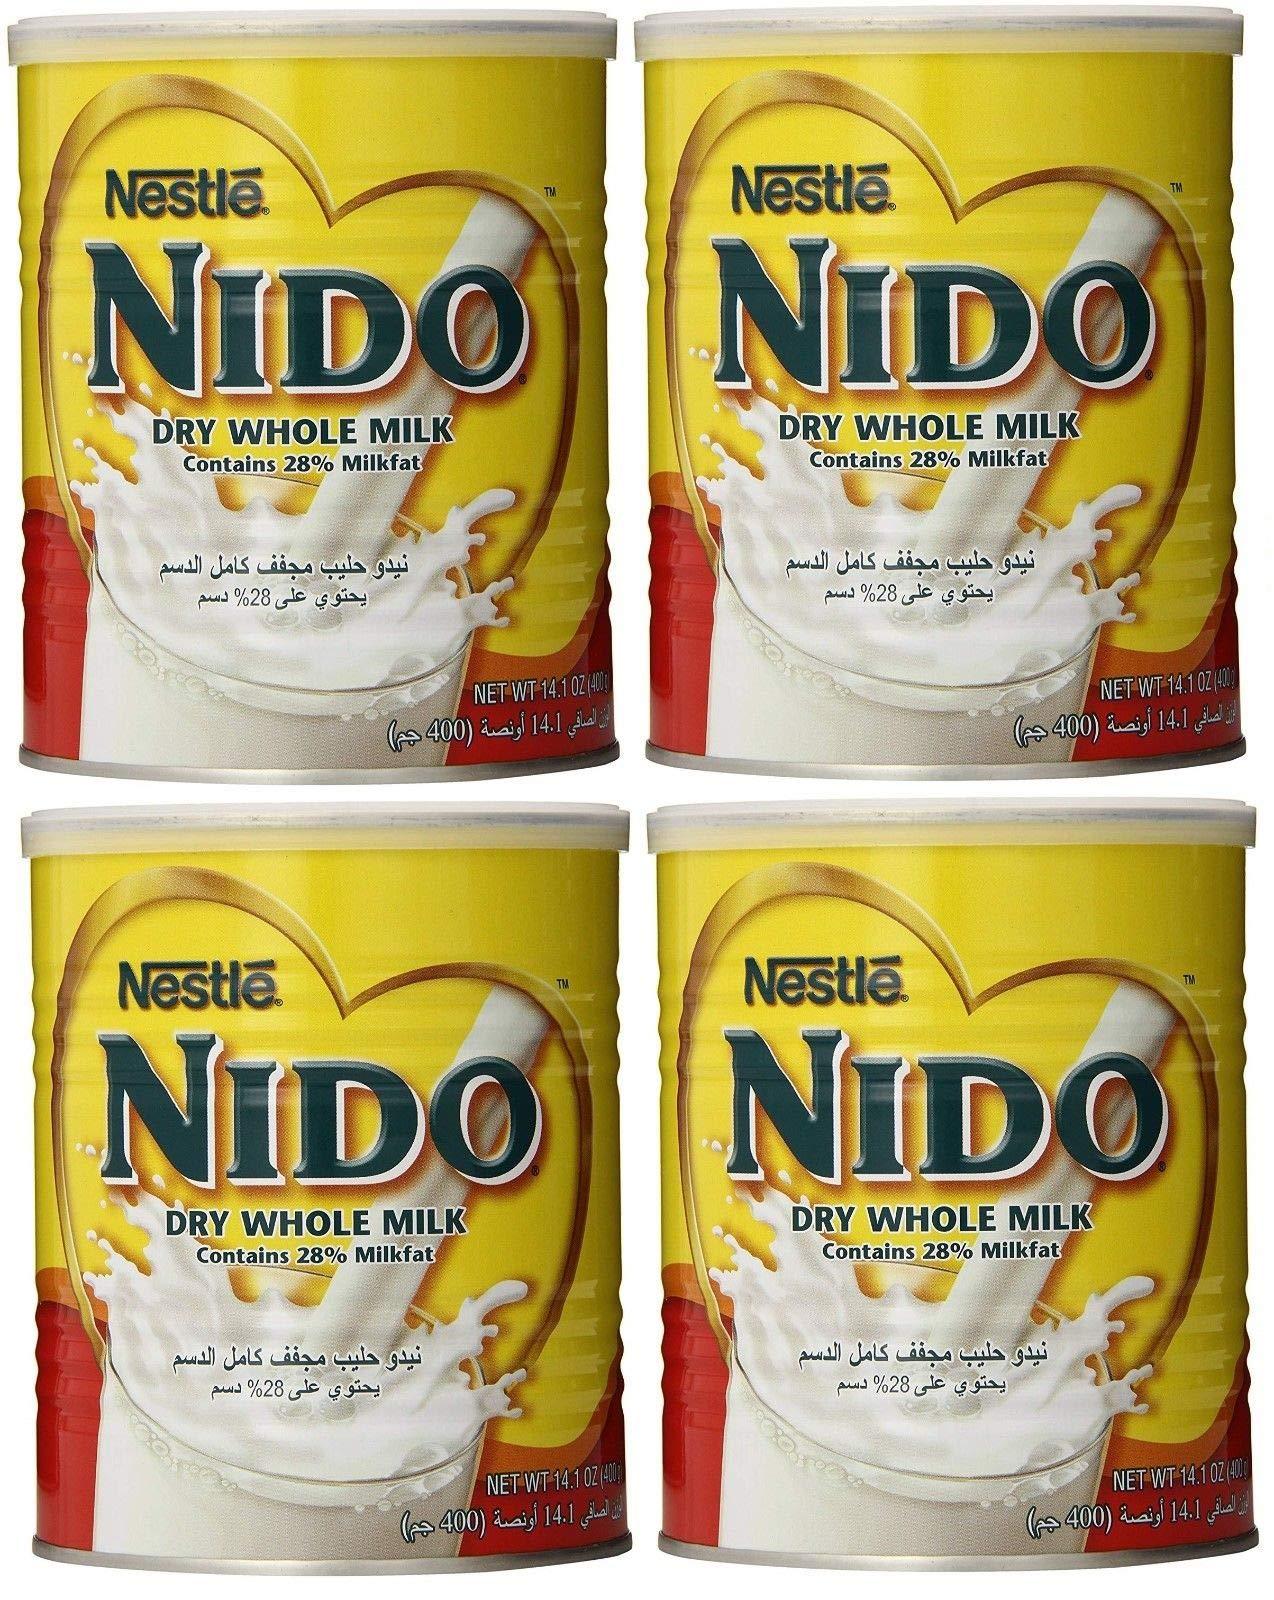 Nido Dry Whole Powder Milk by Nestle - 4 Cans - 400Gr - نيدو حليب مجفف كامل الدسم